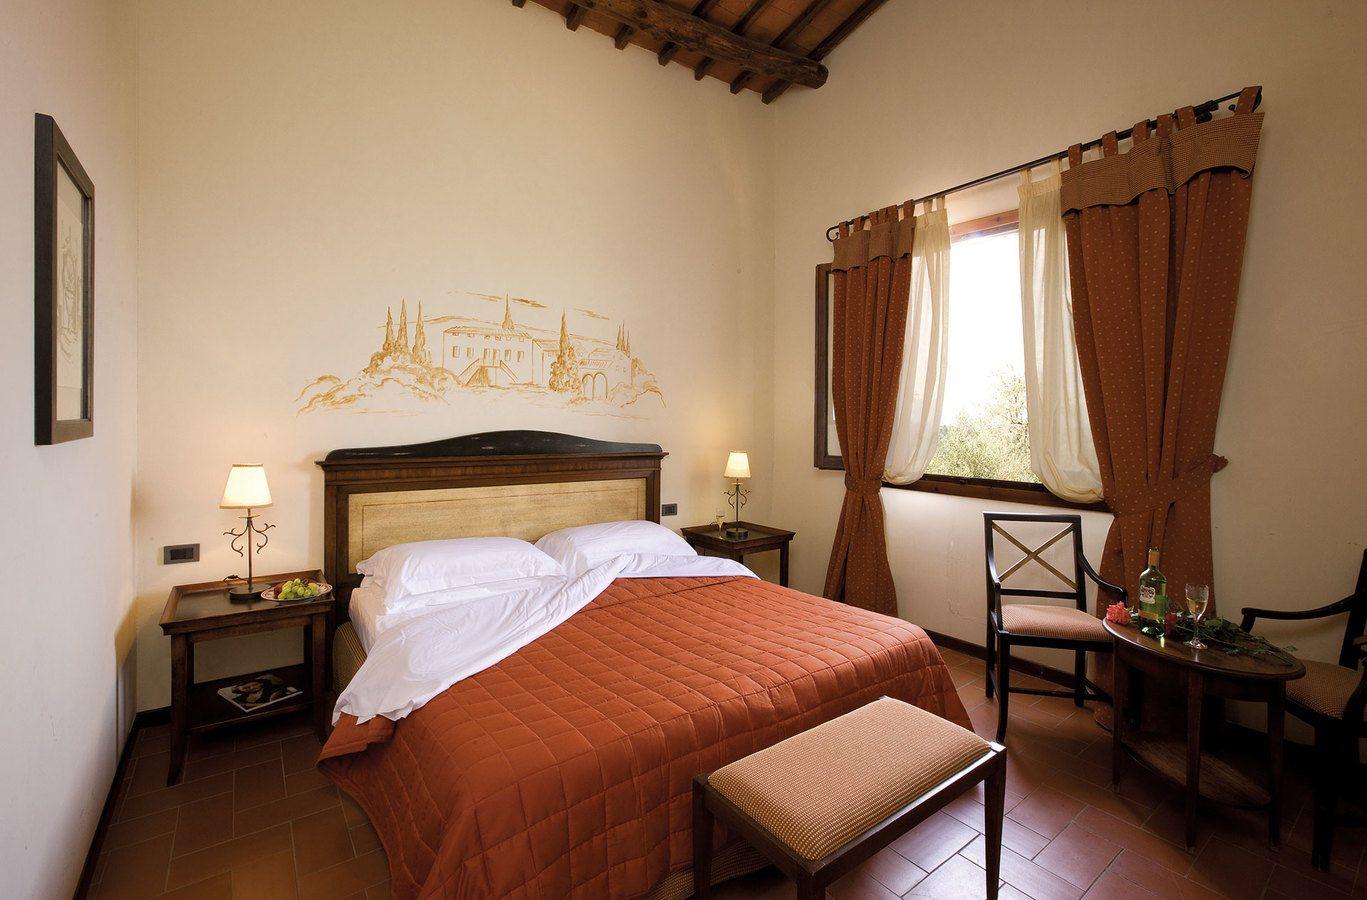 Camere Agriturismo in Toscana - Poggitazzi